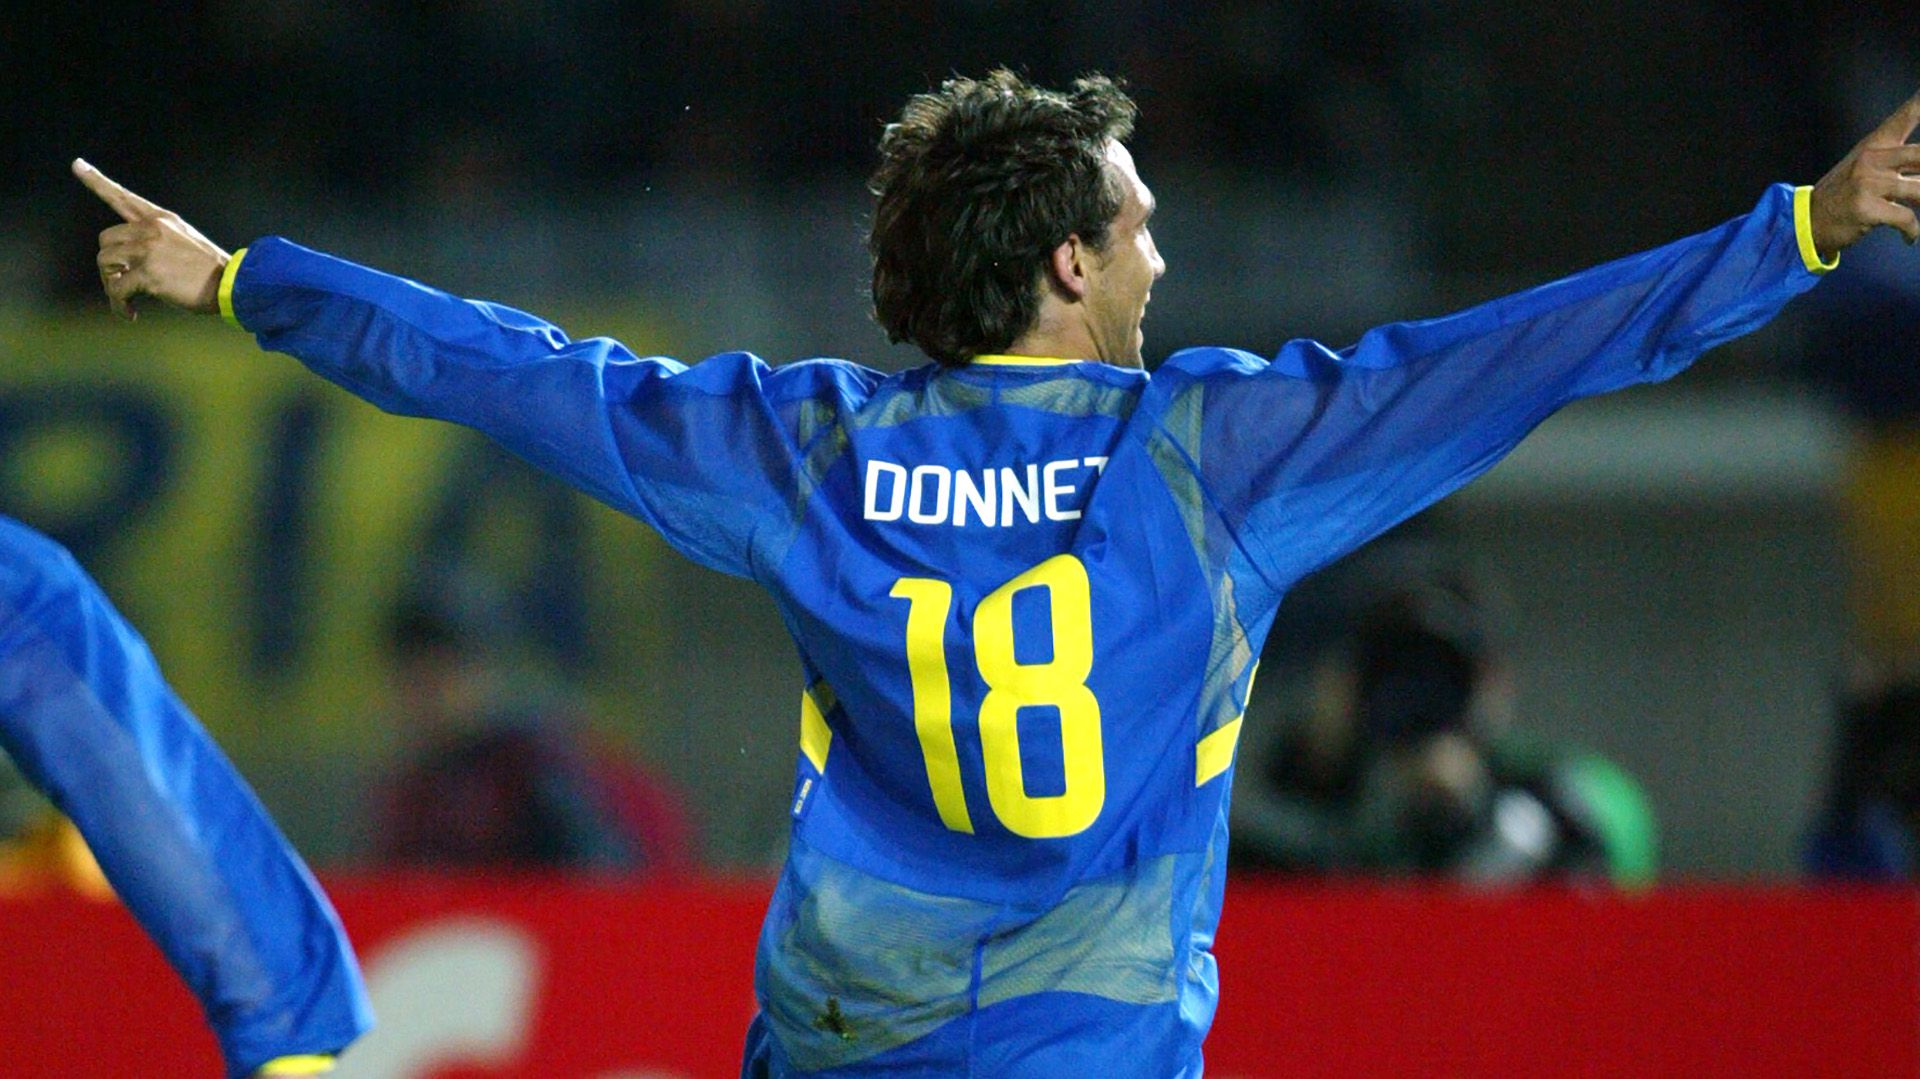 Matías Donnet - Boca Juniors vs Milan Italia - Copa Intercontinental 2003